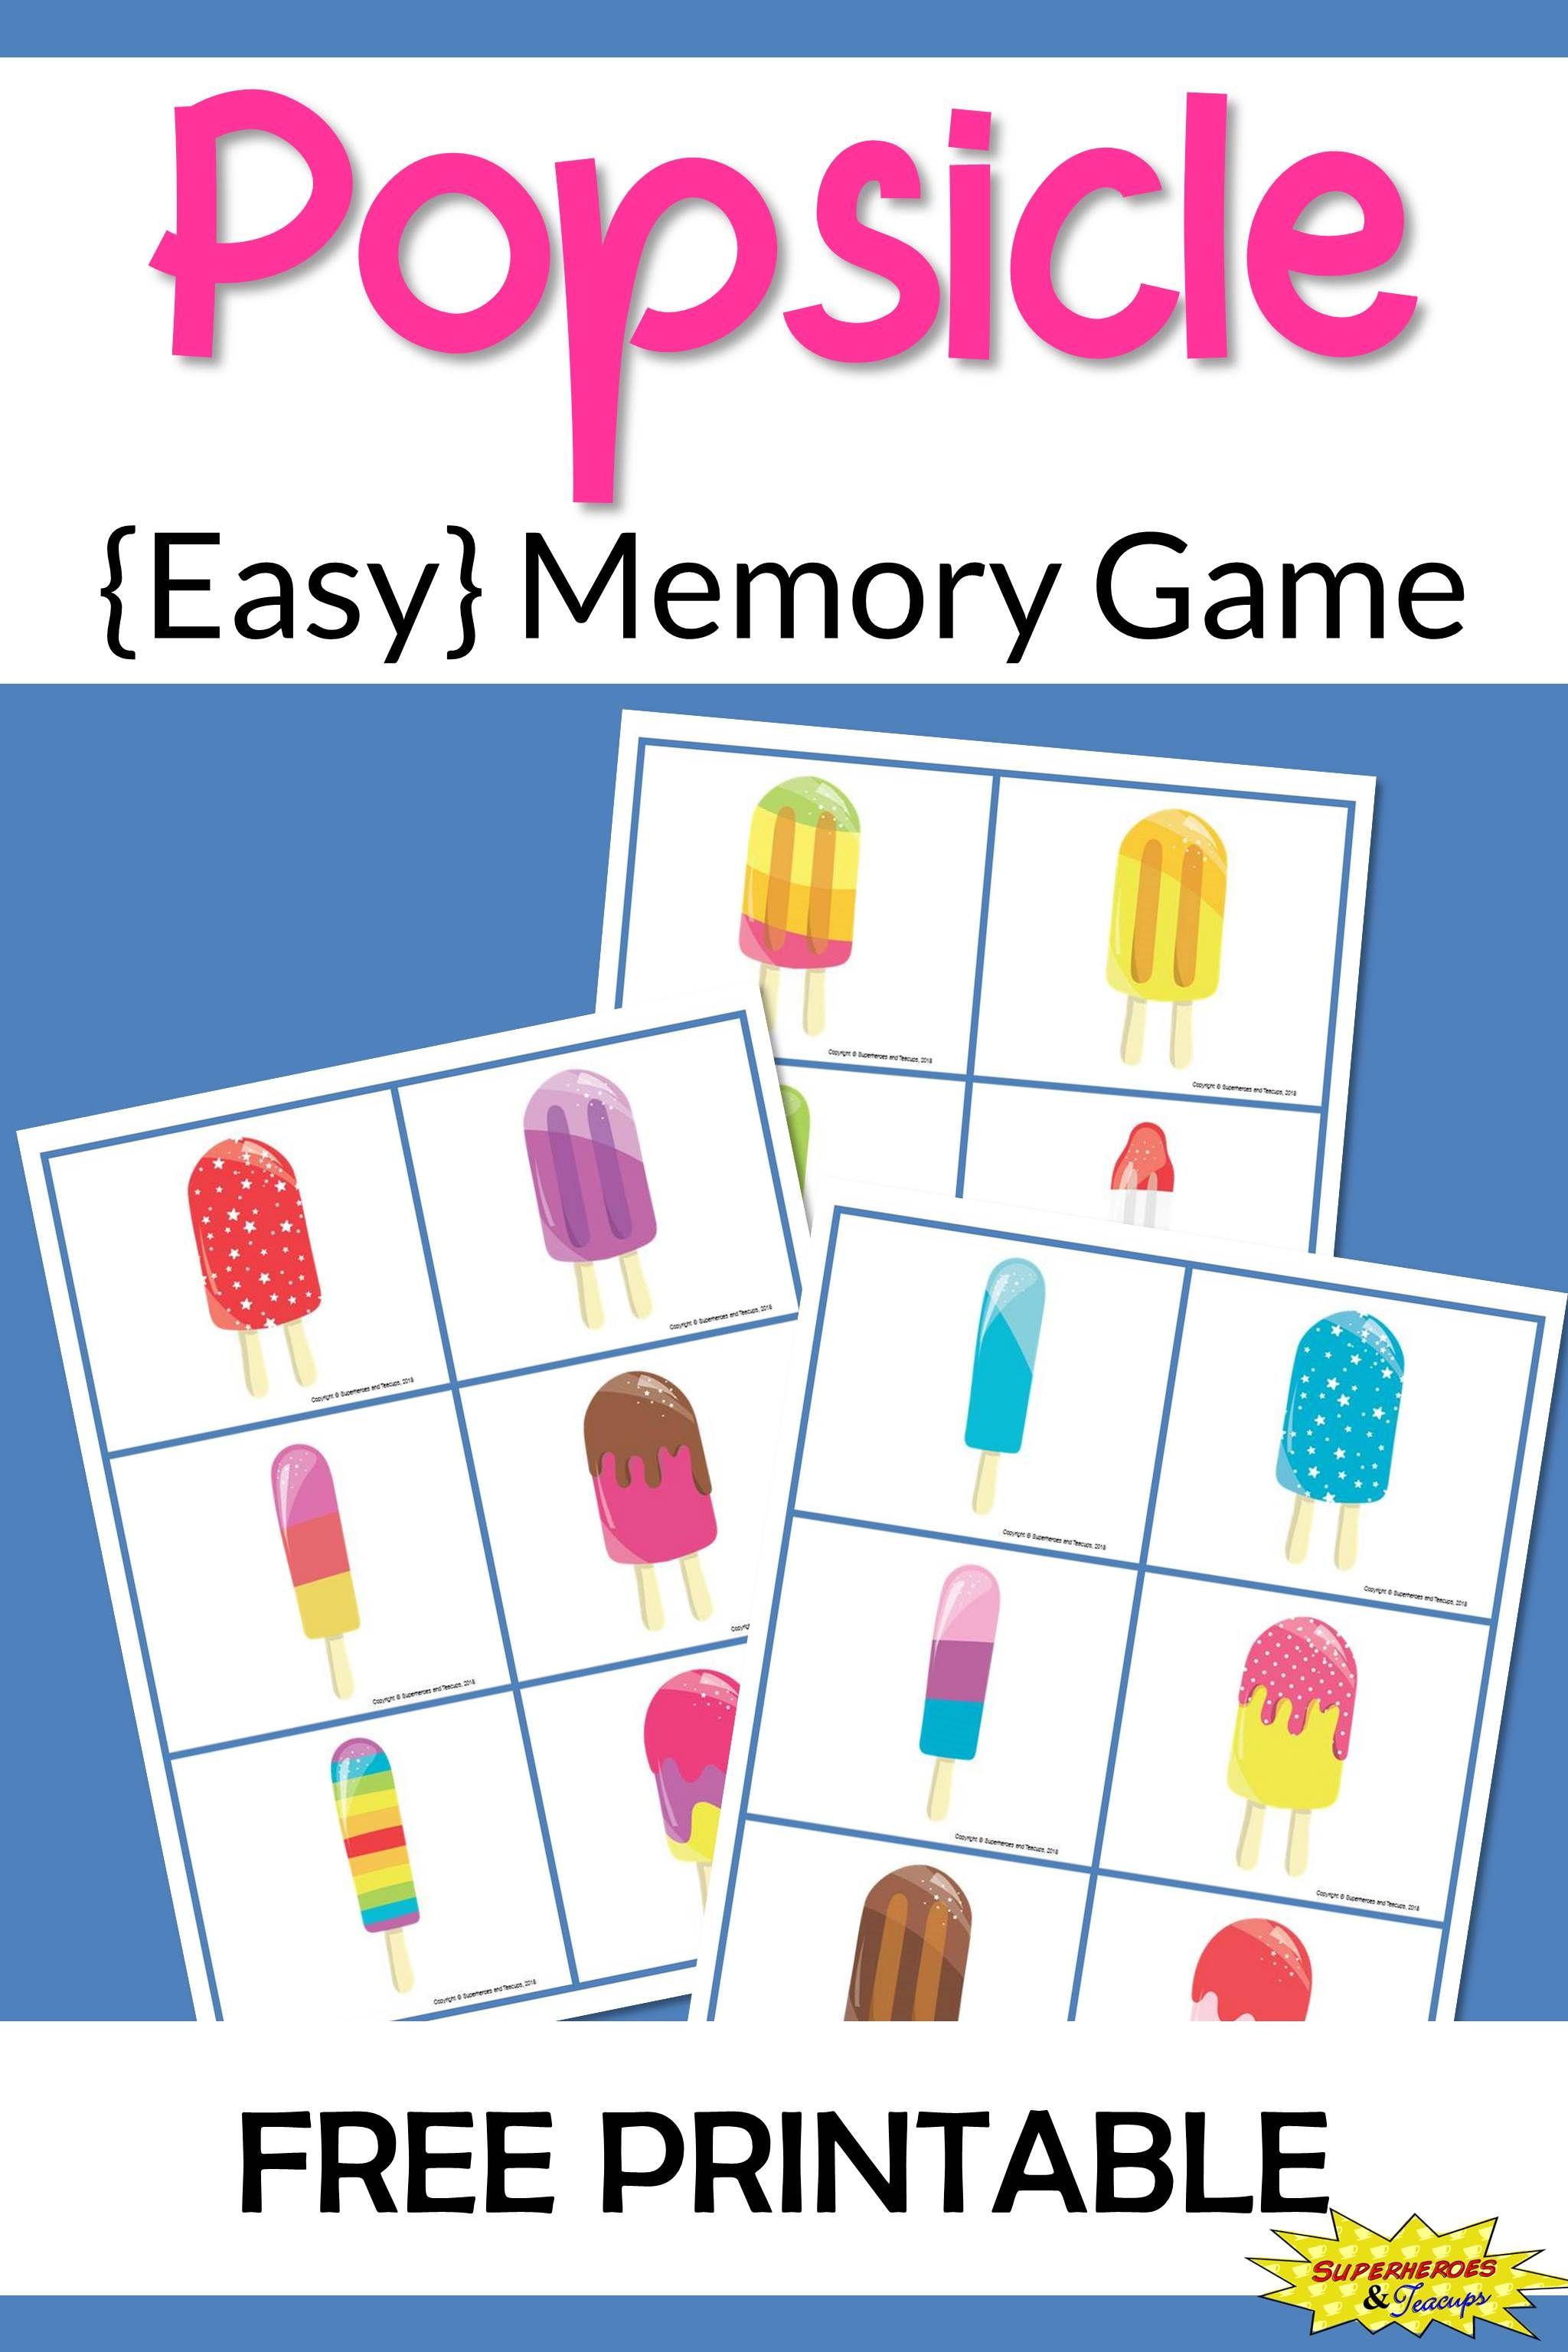 Popsicle Memory Game Free Printable For Kids